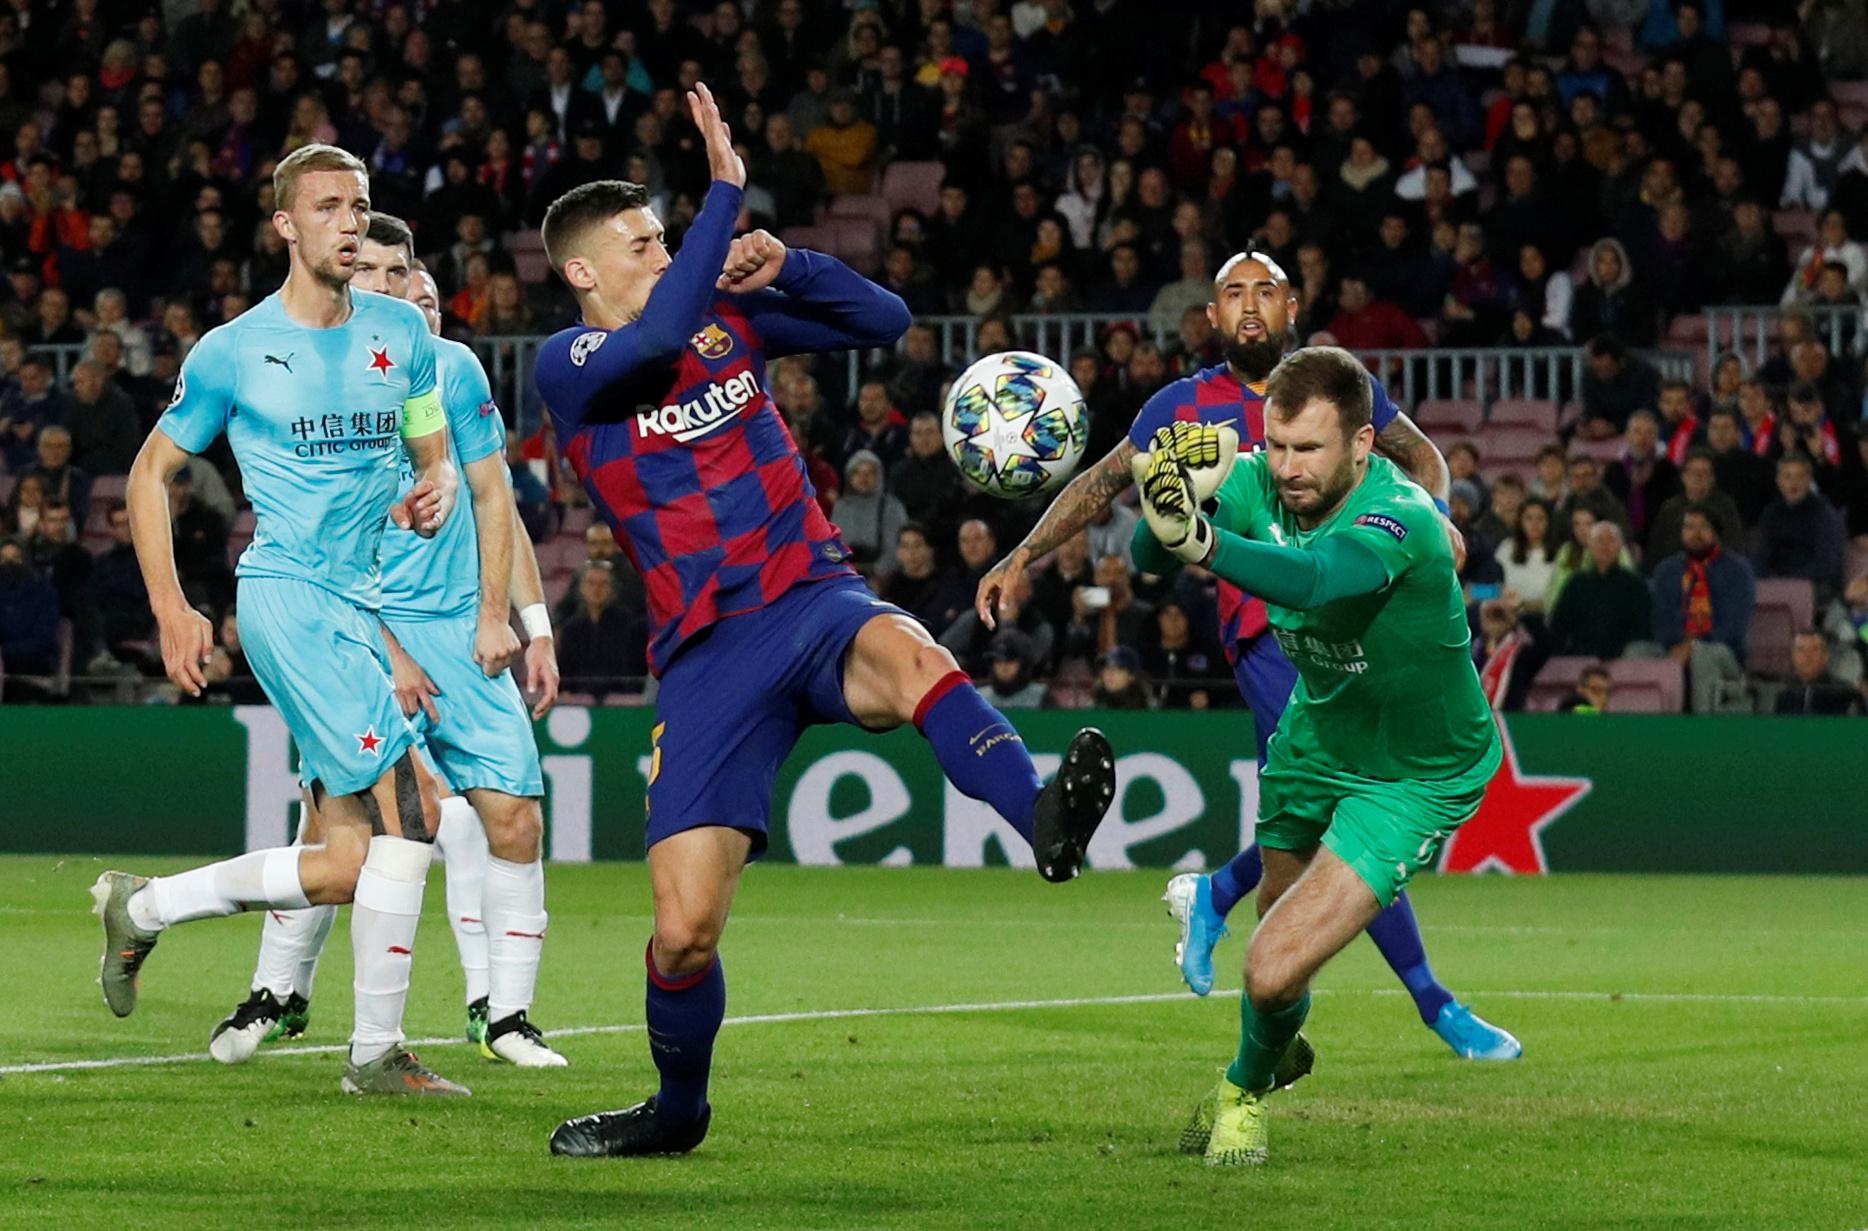 Slavia Prague slam Barcelona players for unprofessional behavior after match